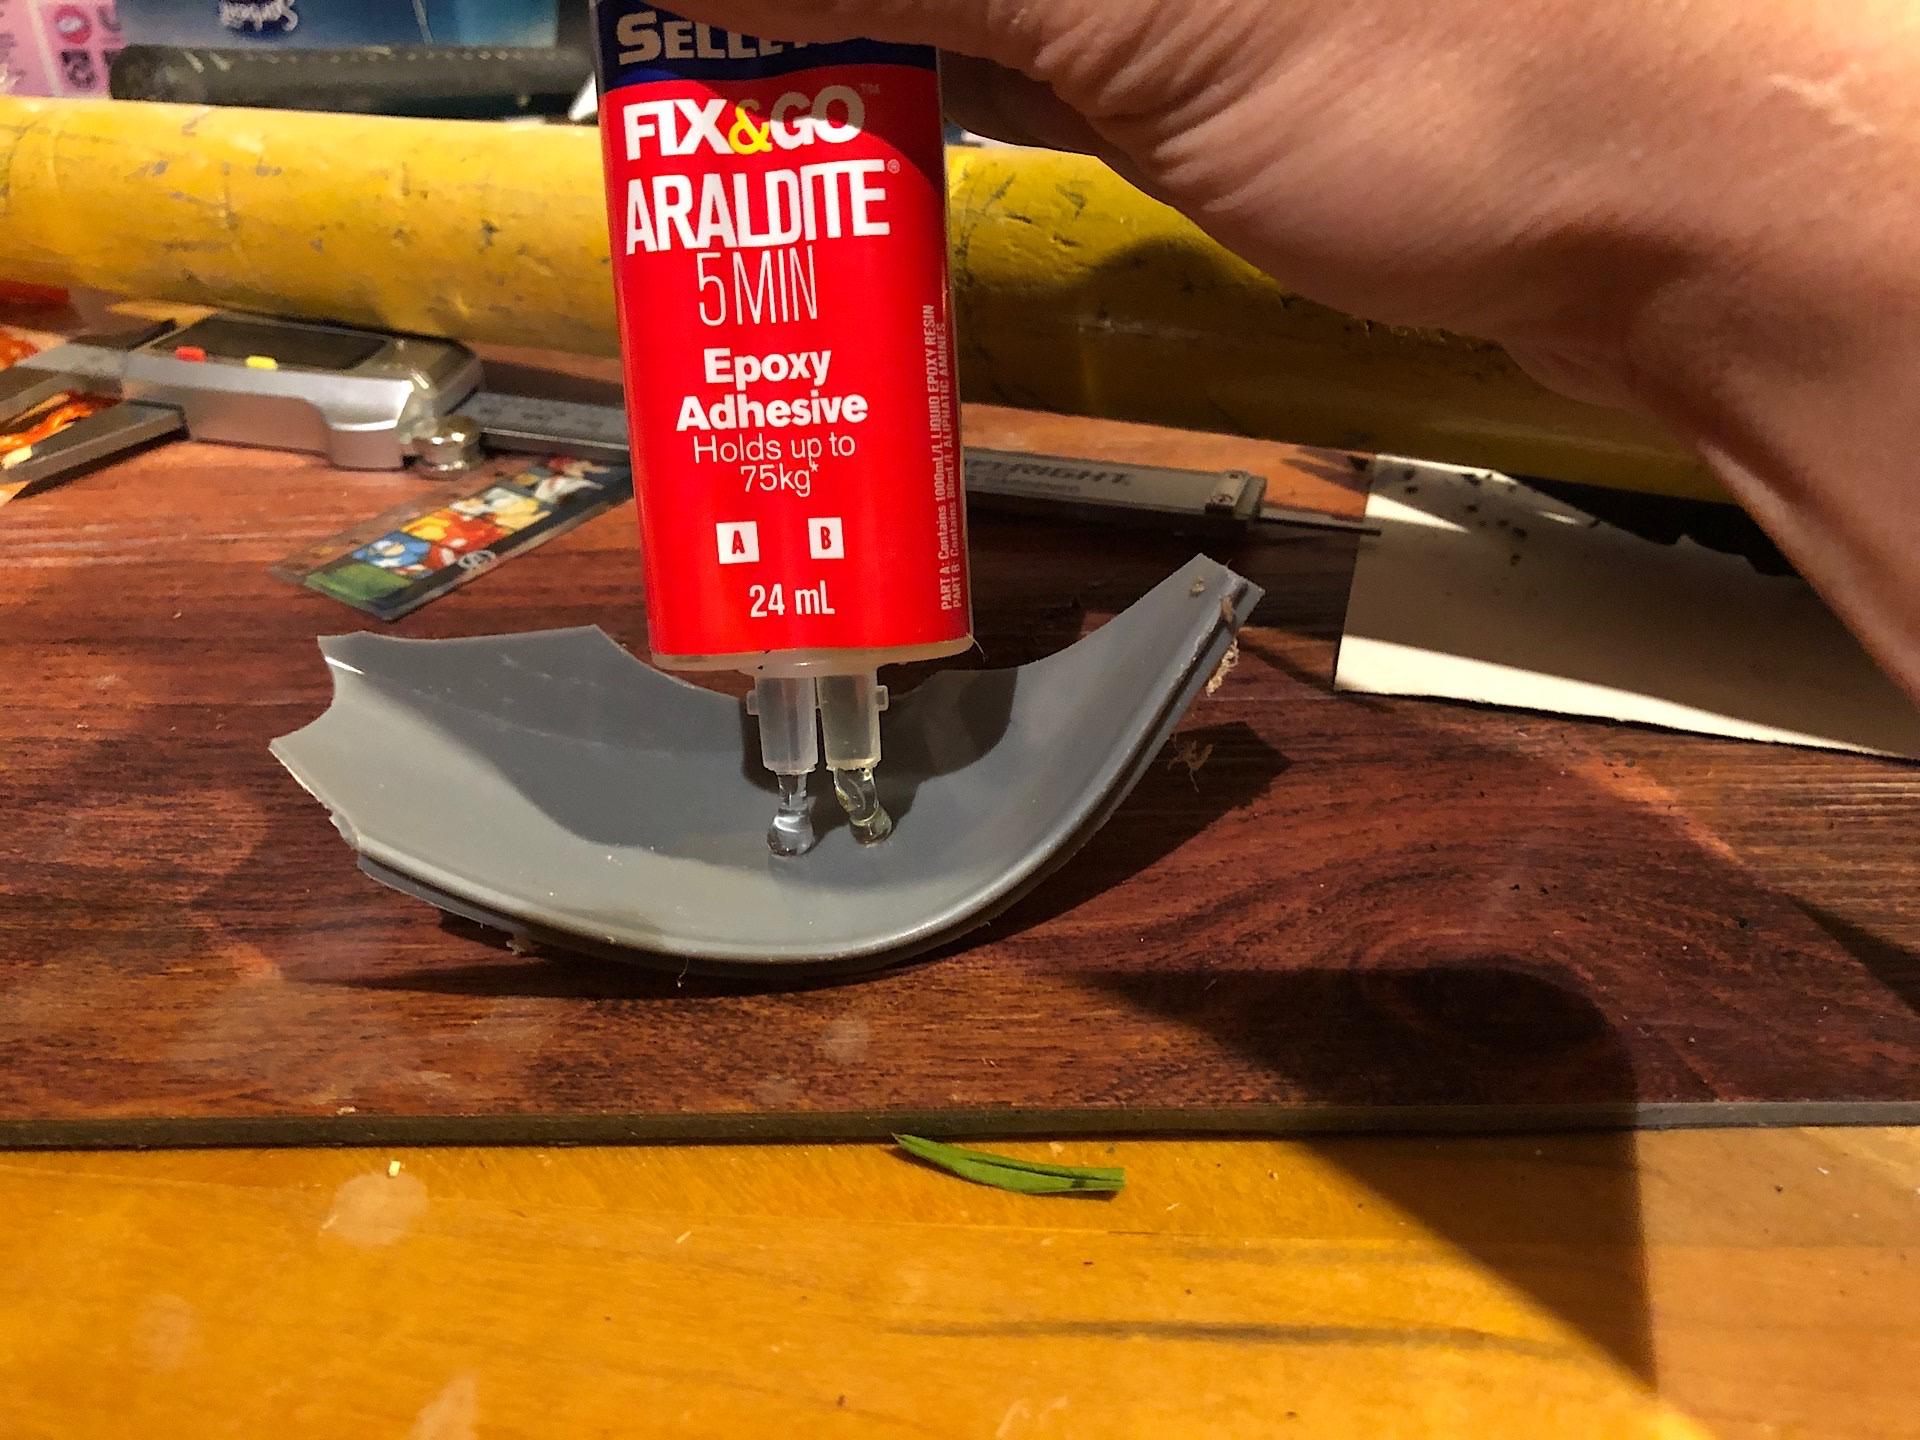 Mixing two-part epoxy